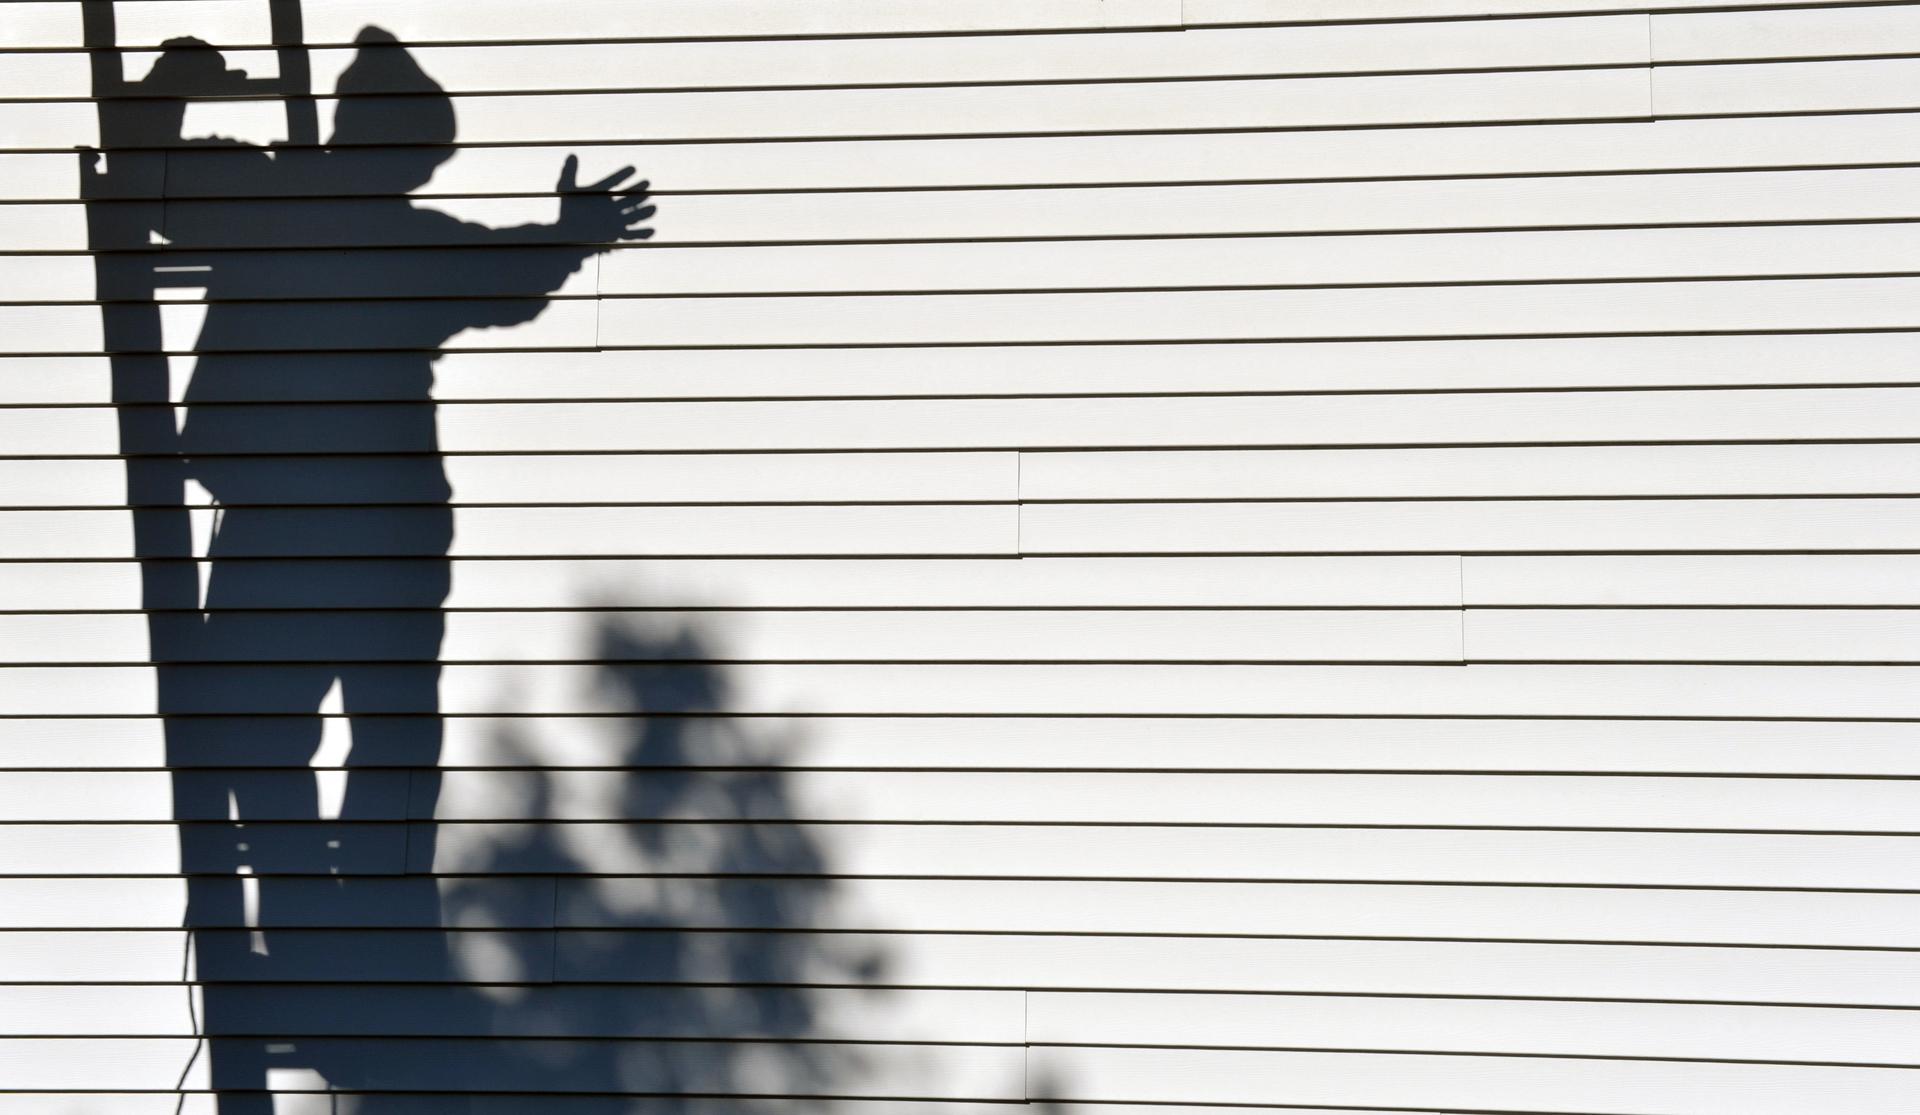 Solar panel shadow